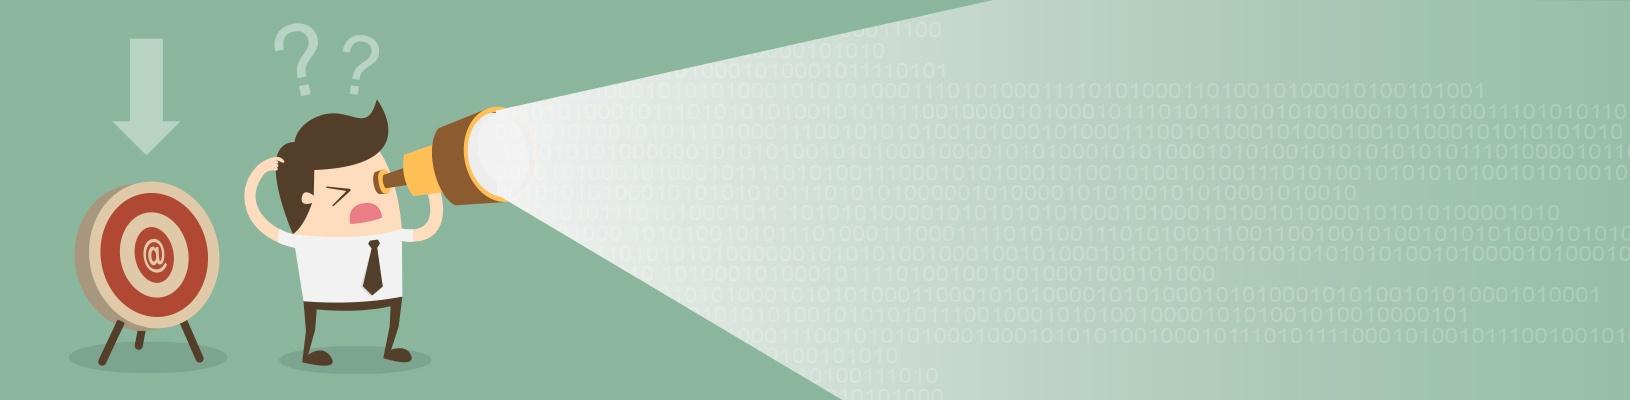 banner web corporativa